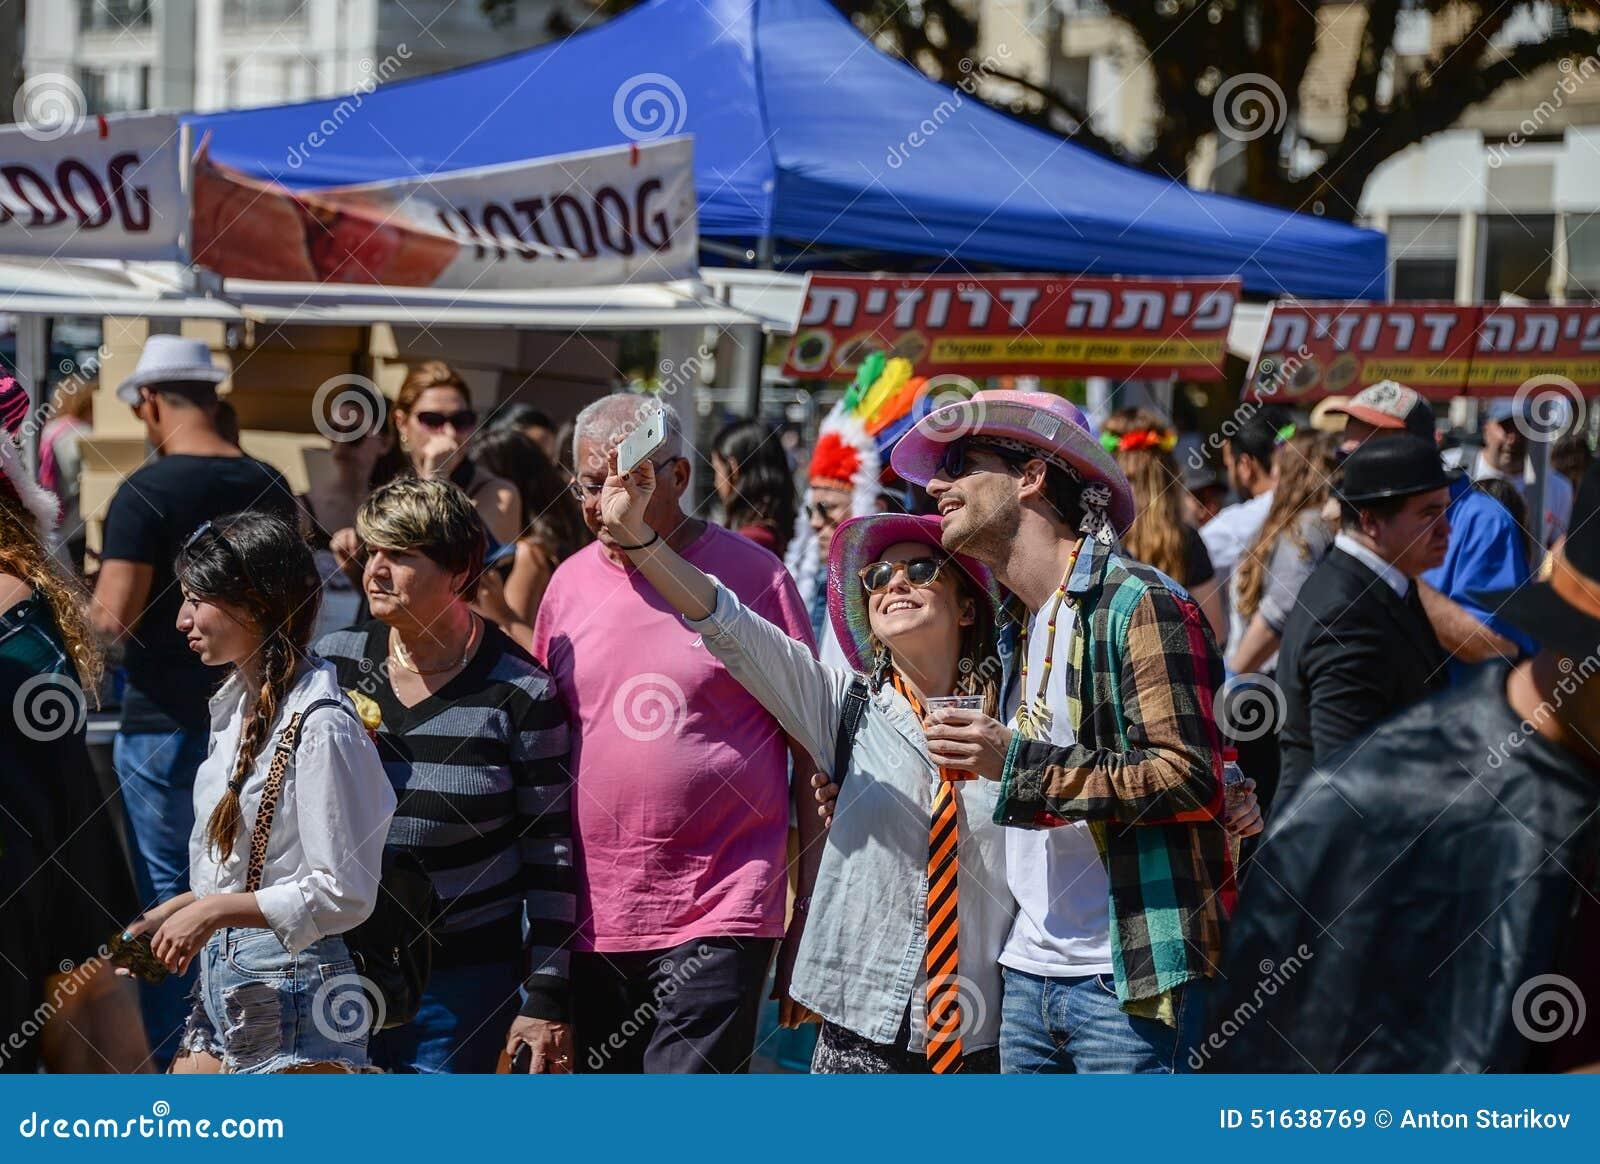 Photos of adult street parties